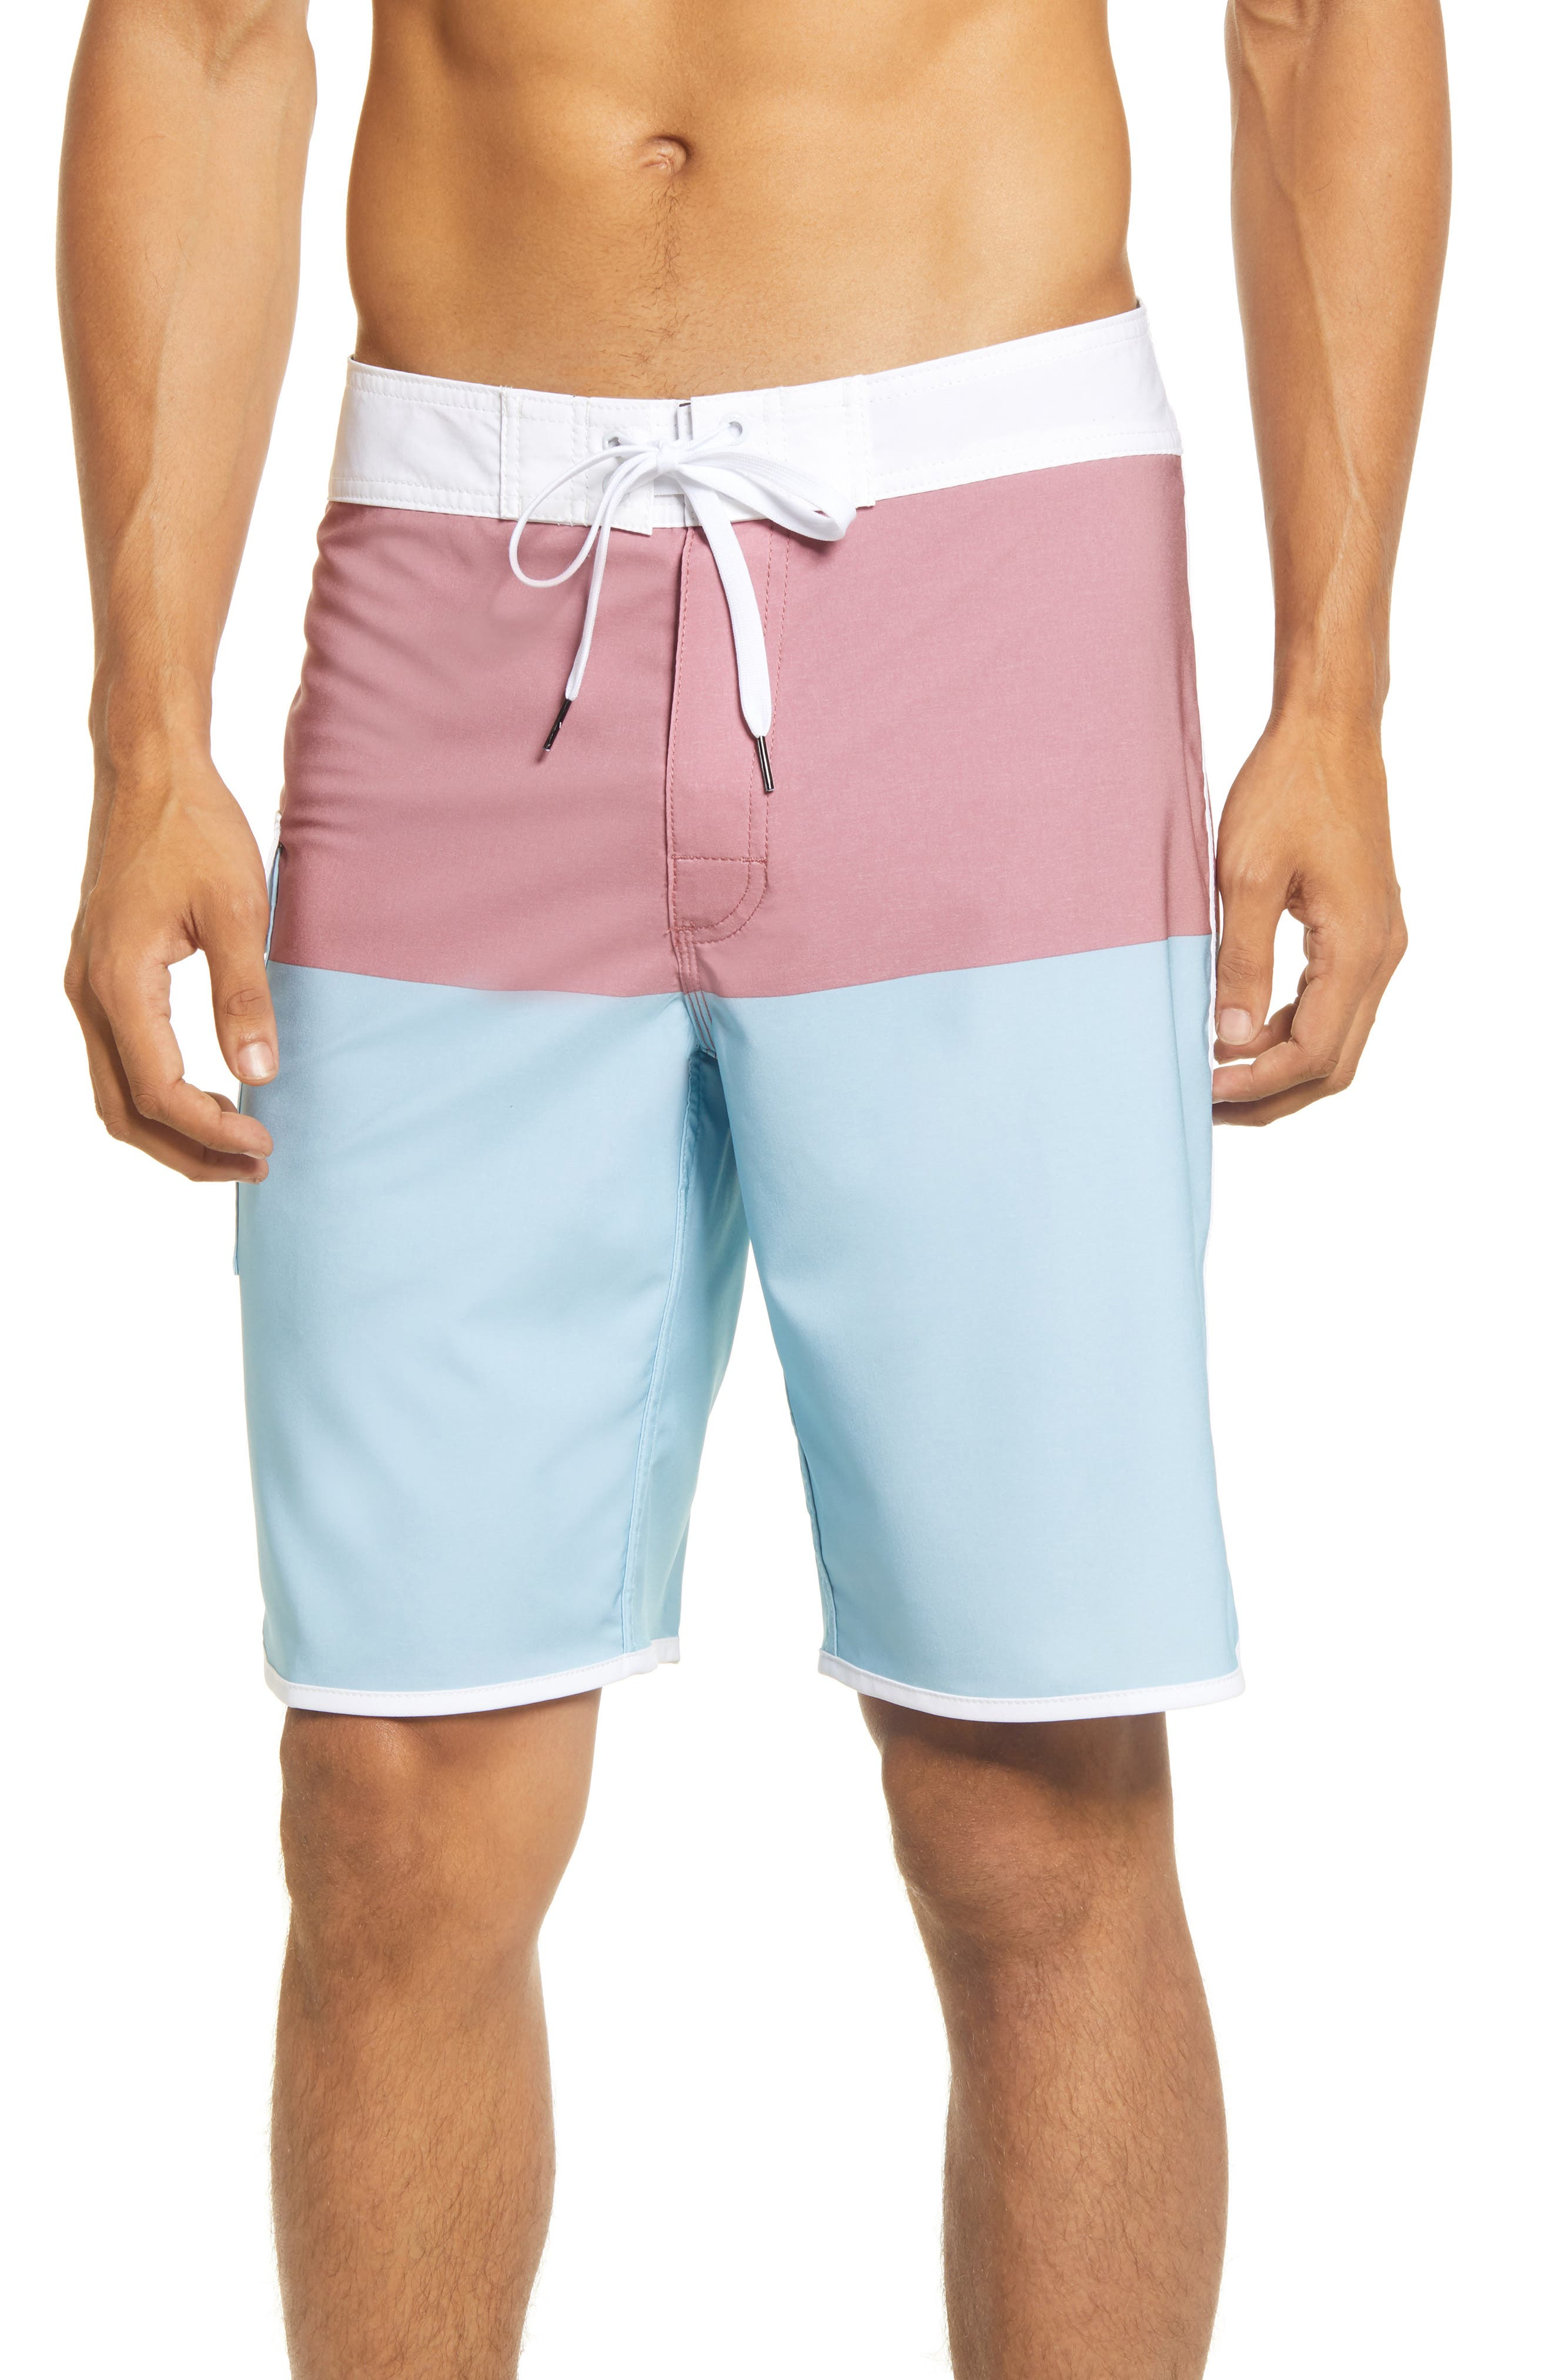 Adidas Mens Response Shorts Baggy Size XL Navy /& Orange Reflective